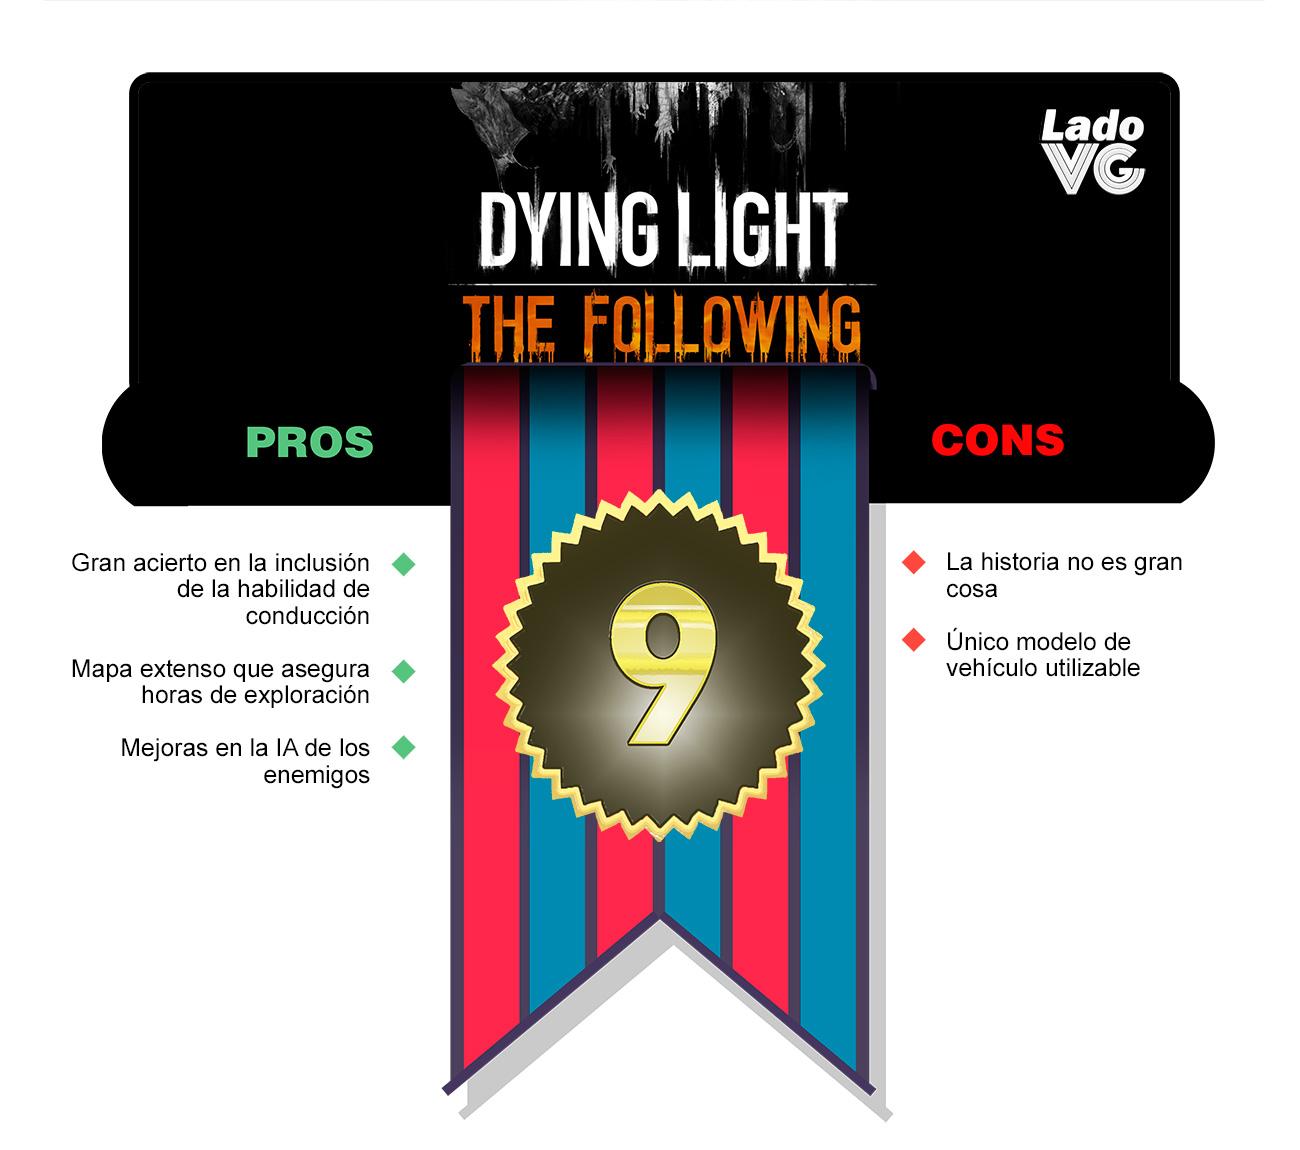 Dying-Light-The-Following-Puntaje